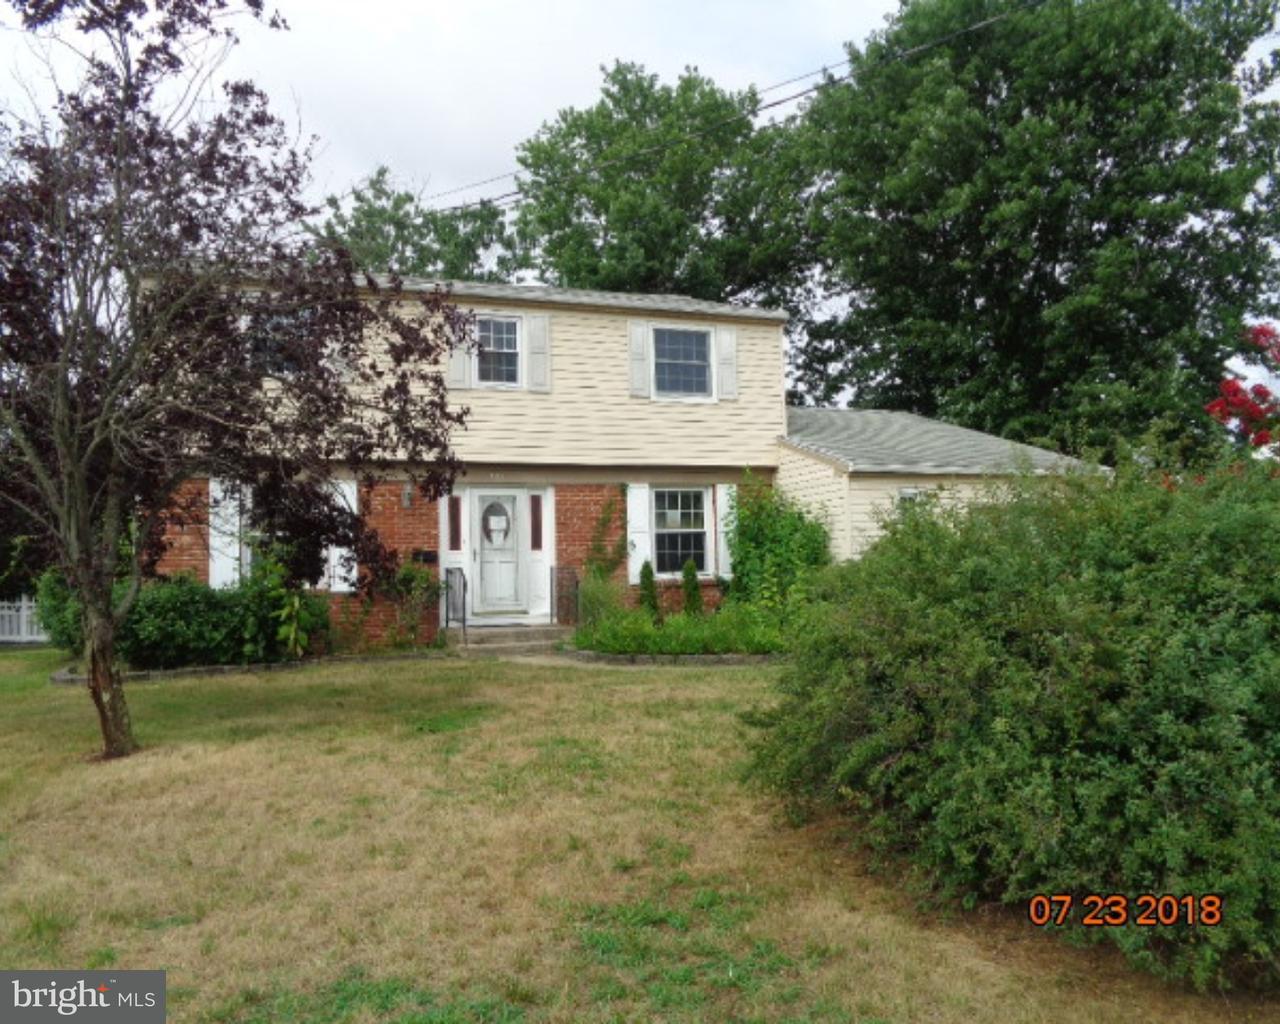 401 Macclelland Avenue Glassboro, NJ 08028